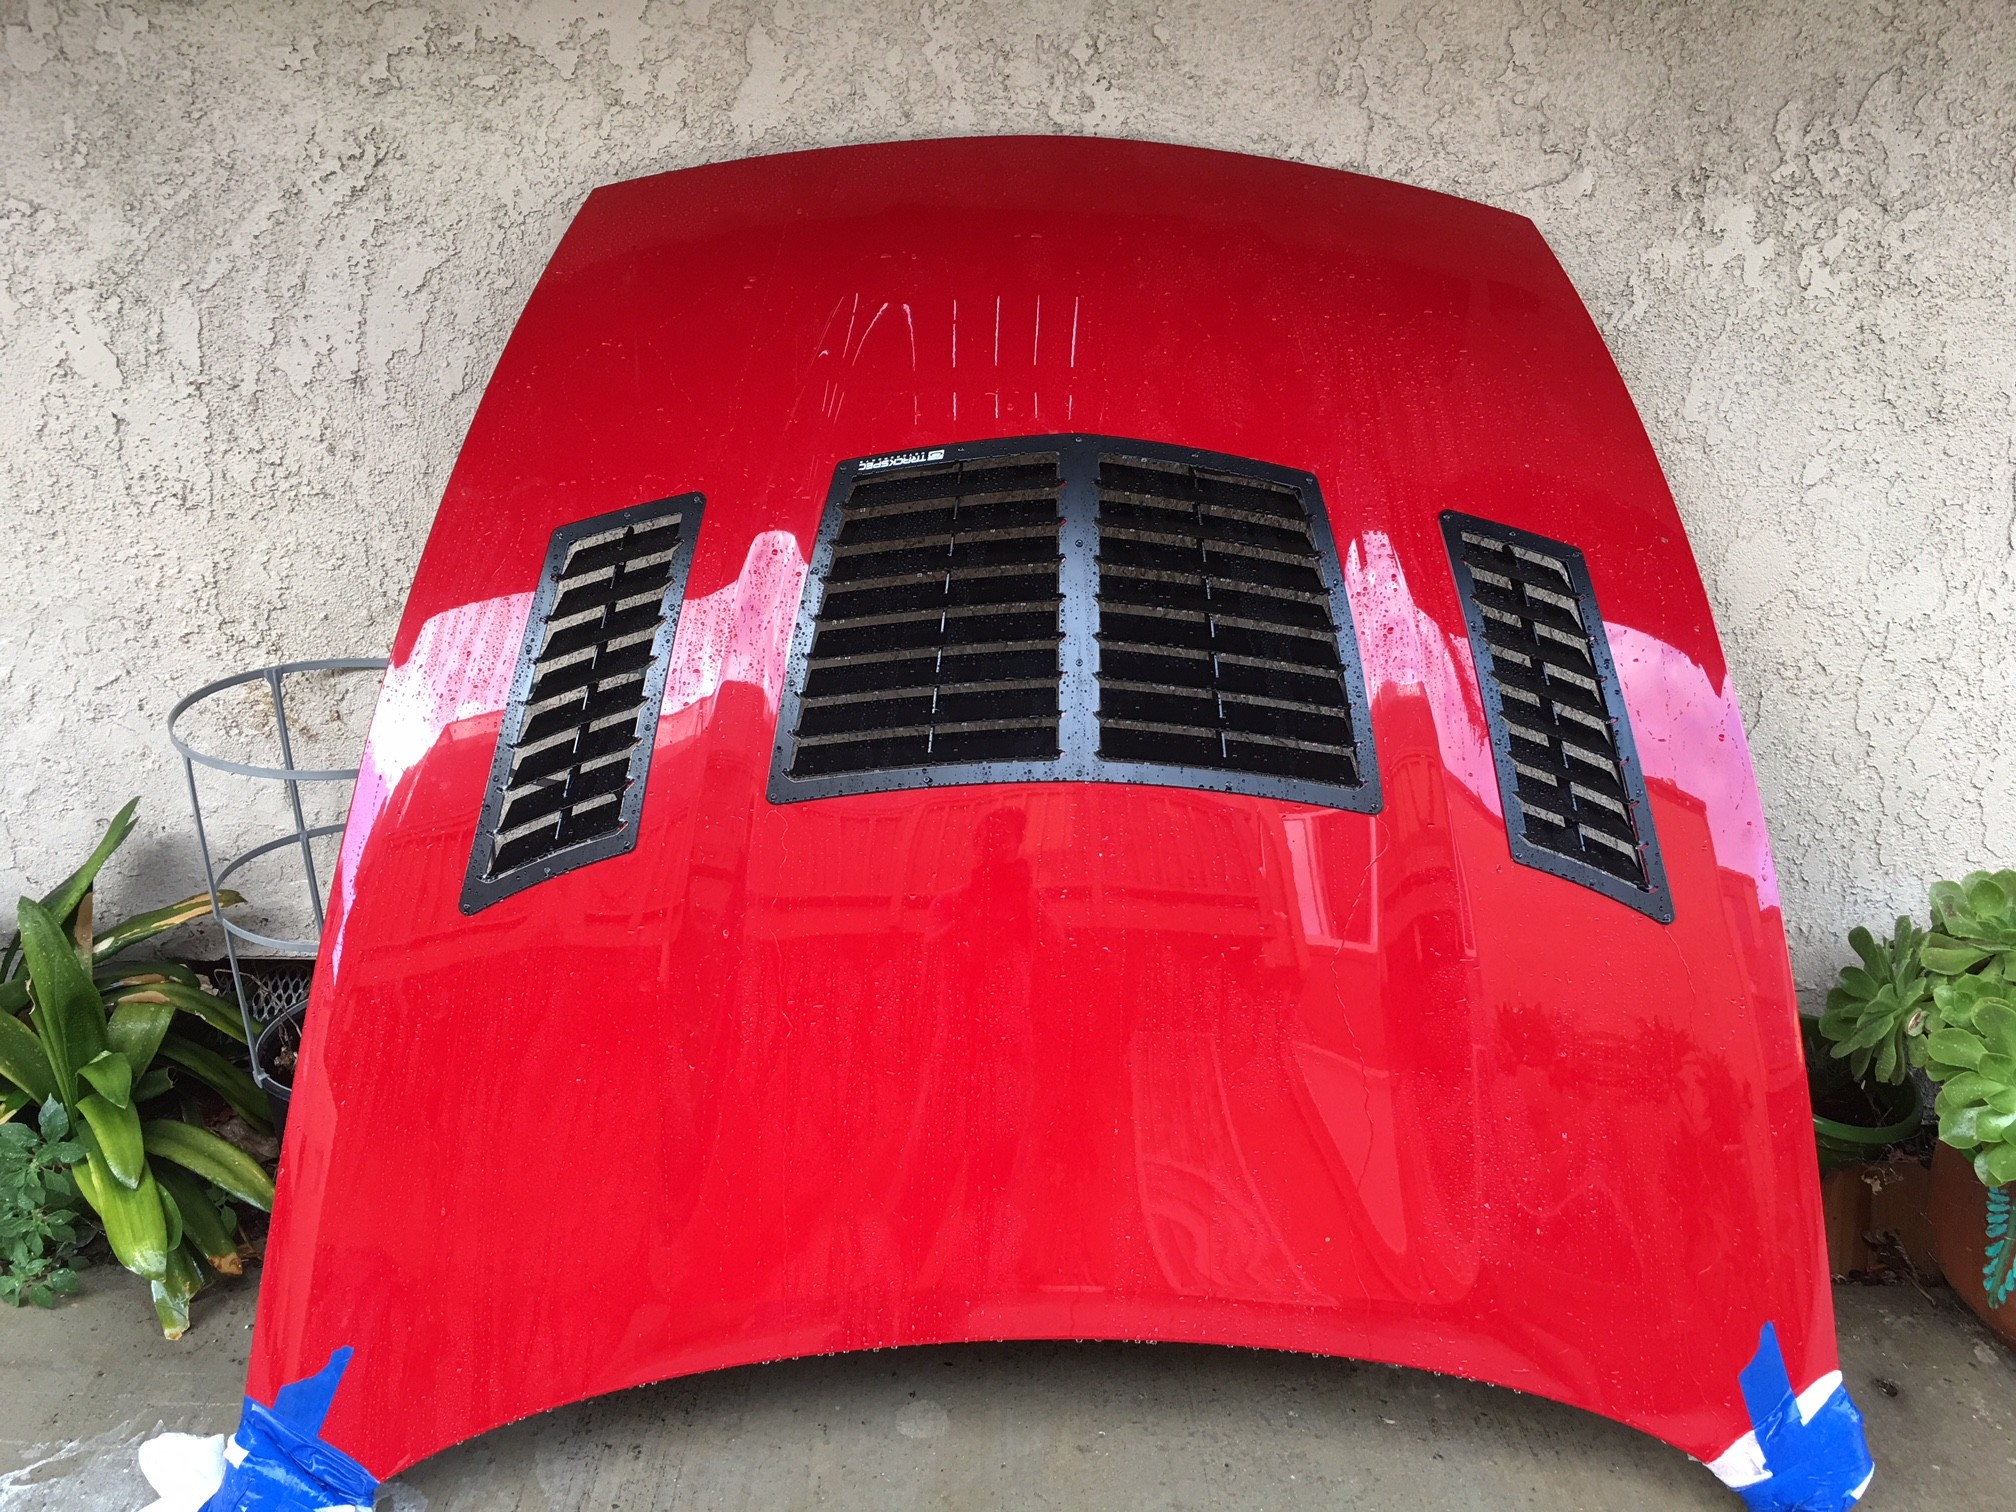 370z hood vent kit nissan side vents views